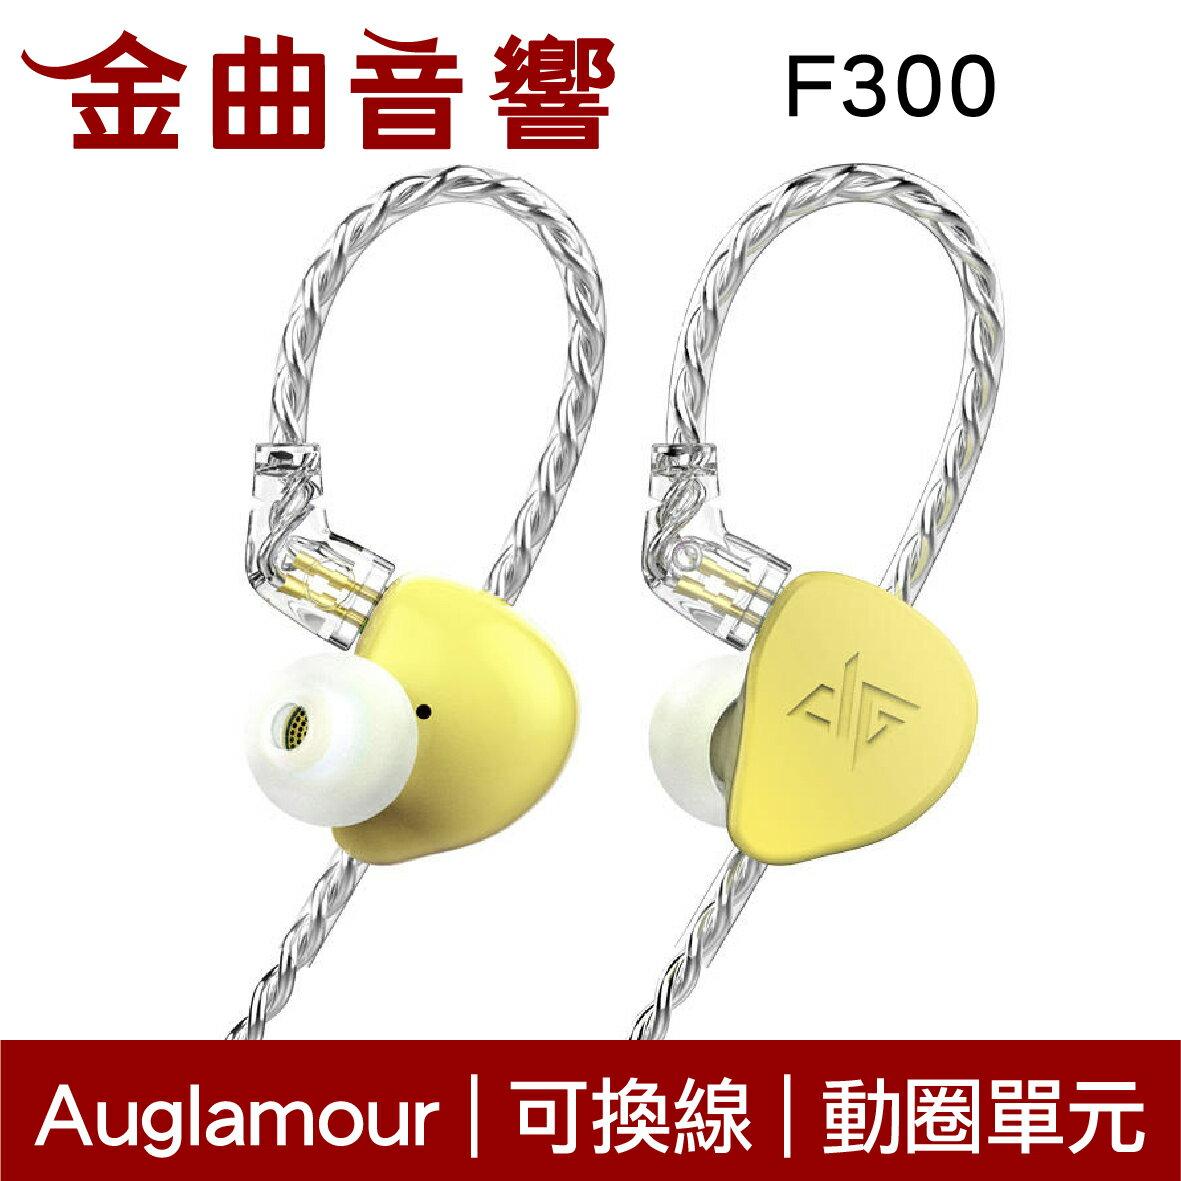 Auglamour 徠聲 F300 四色可選 耳道式耳機 可換線   金曲音響